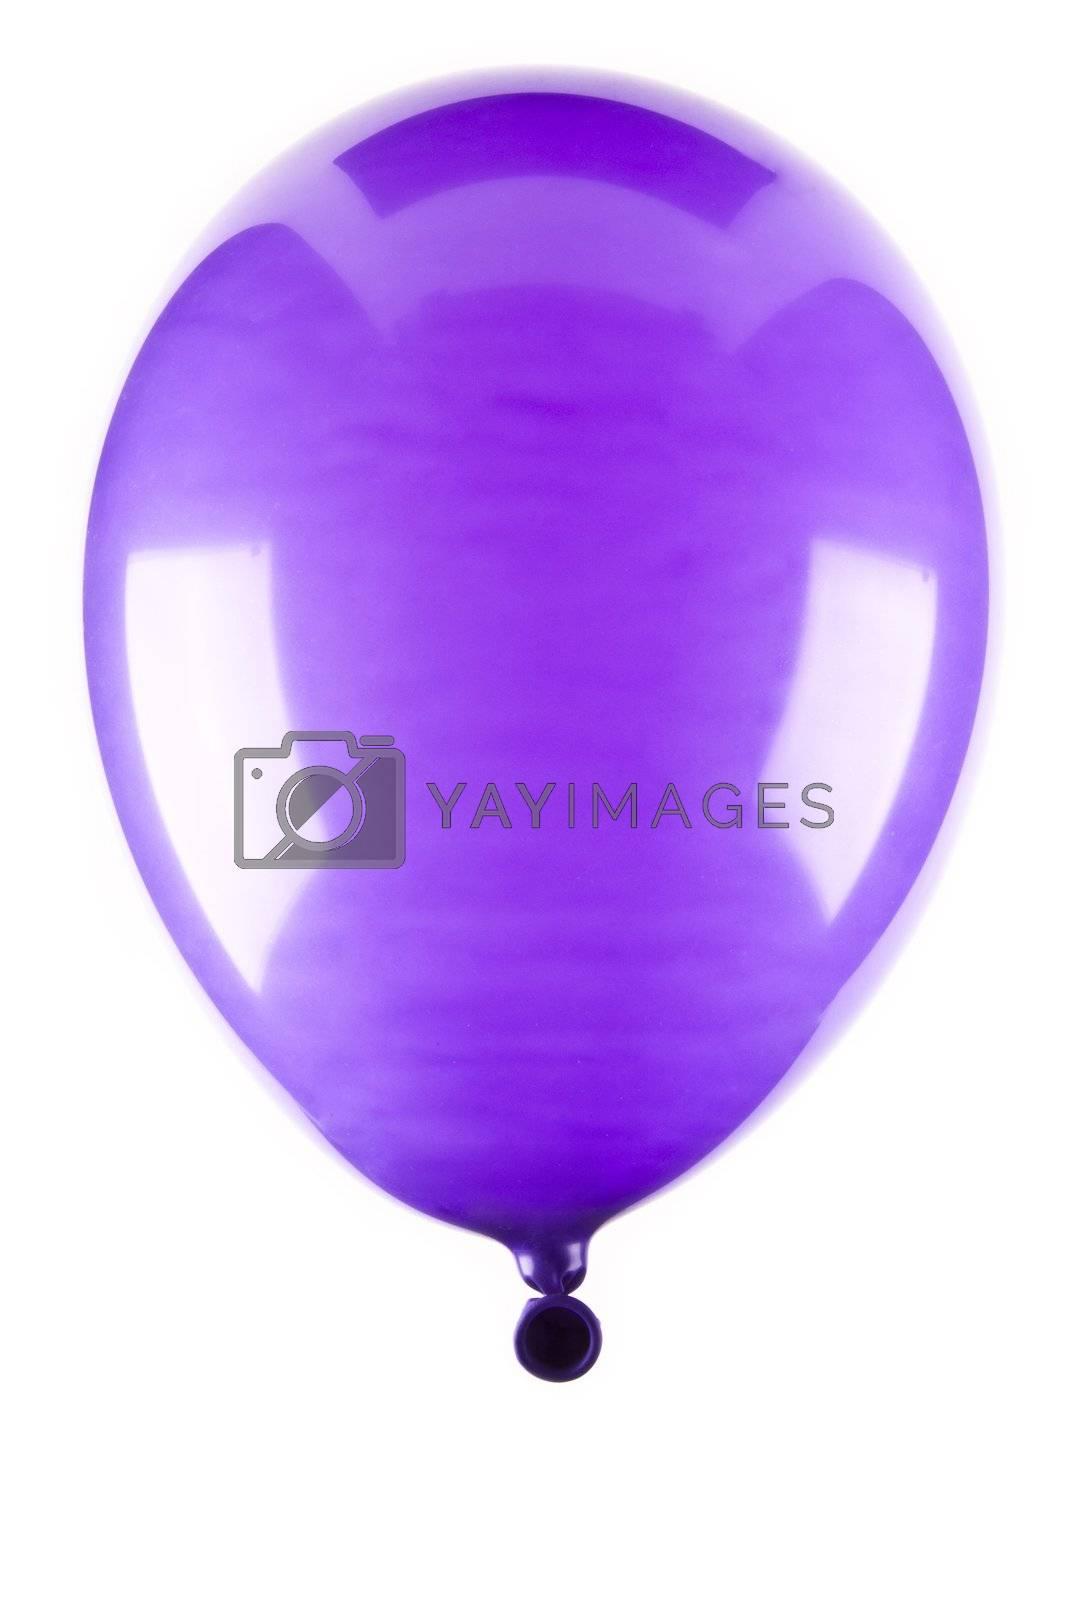 Vibrant purple balloon isolated on white background